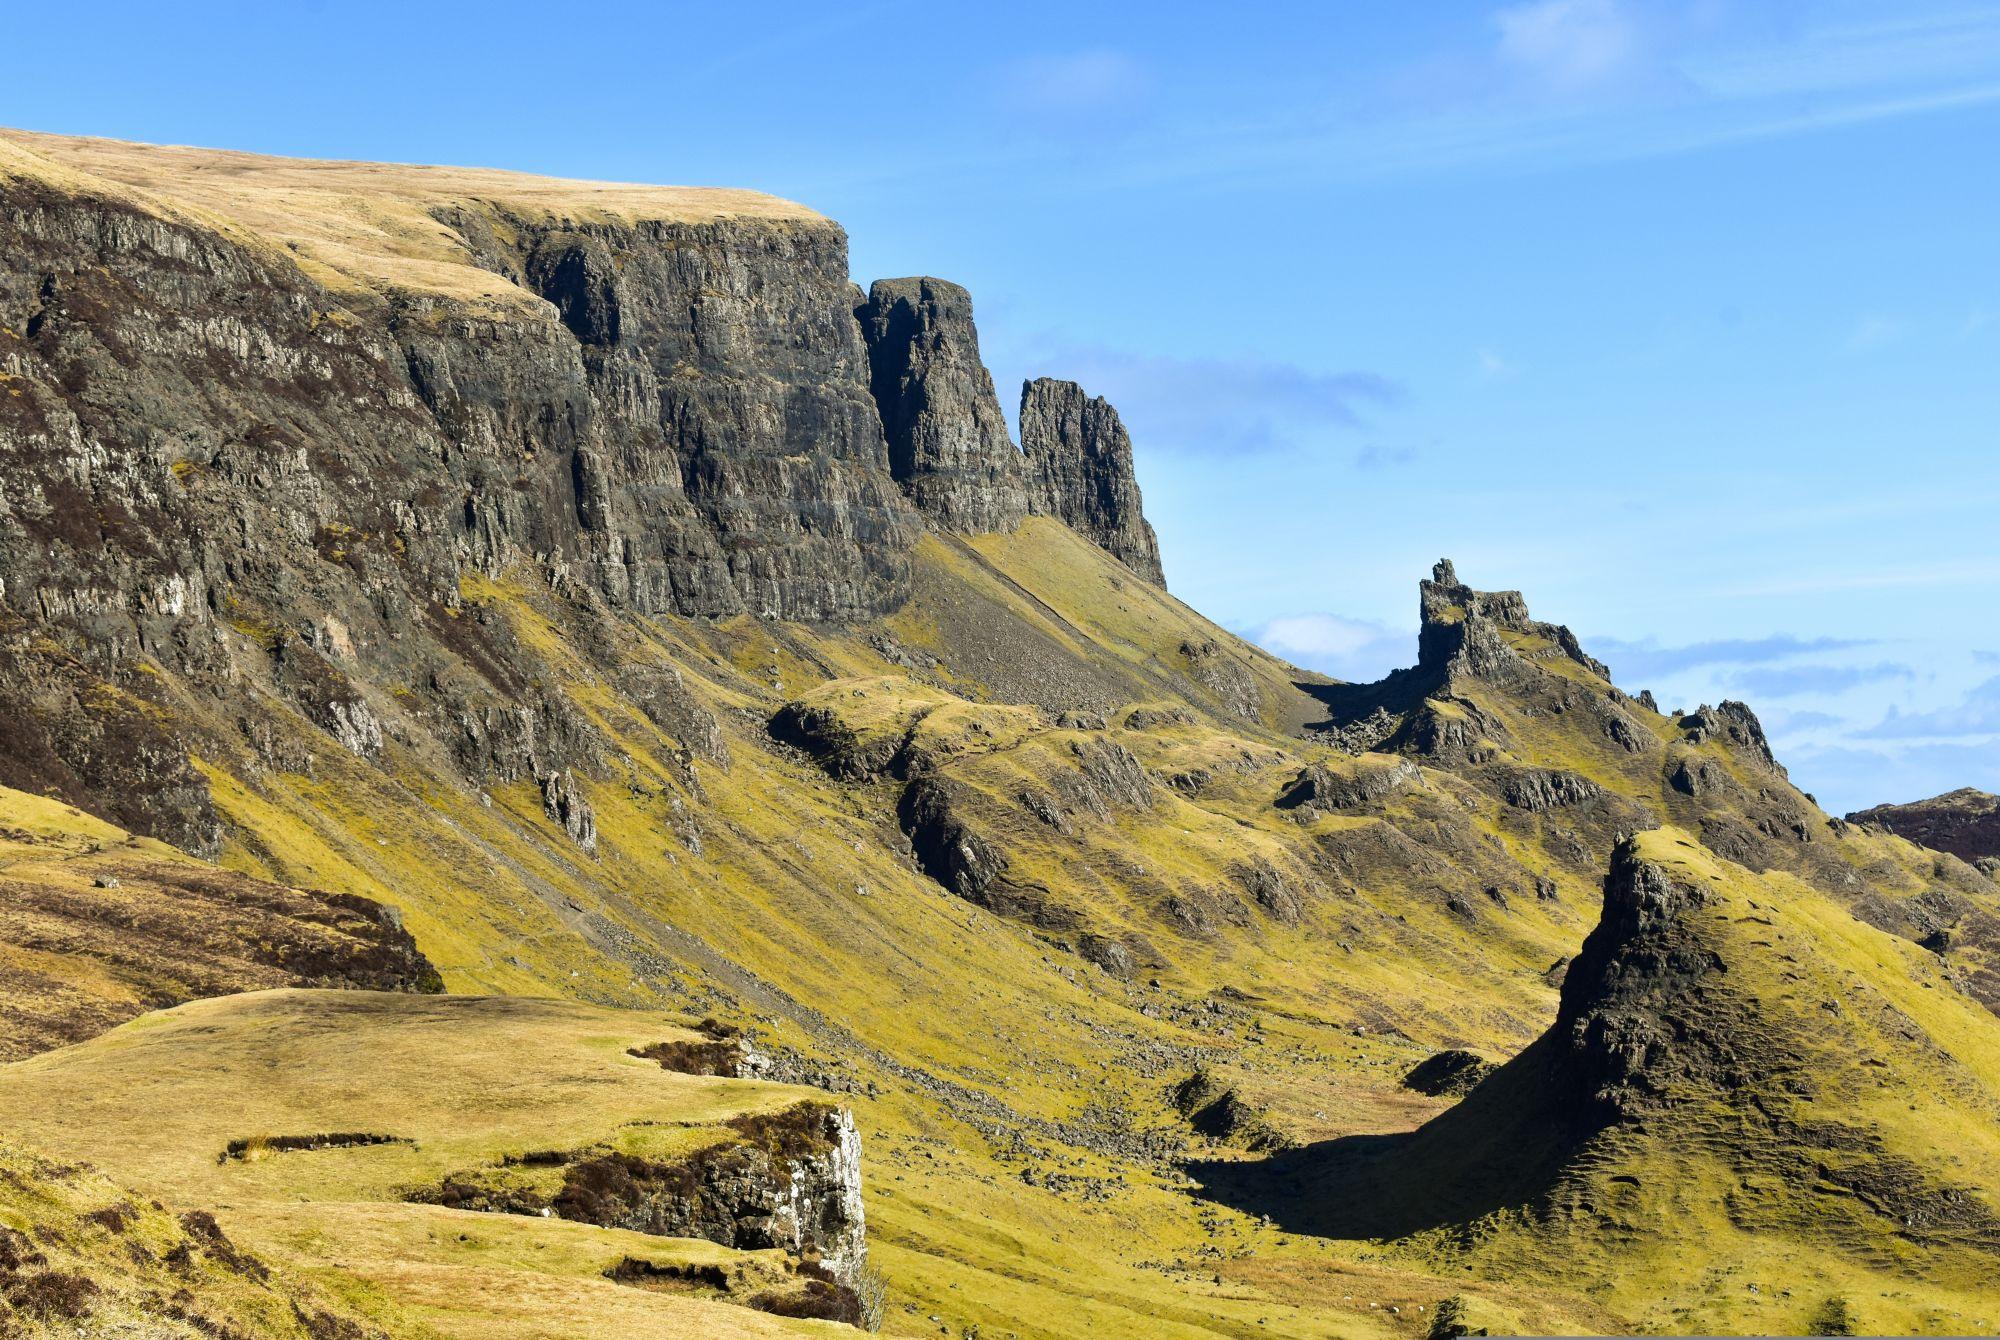 The Quiriang Mountains